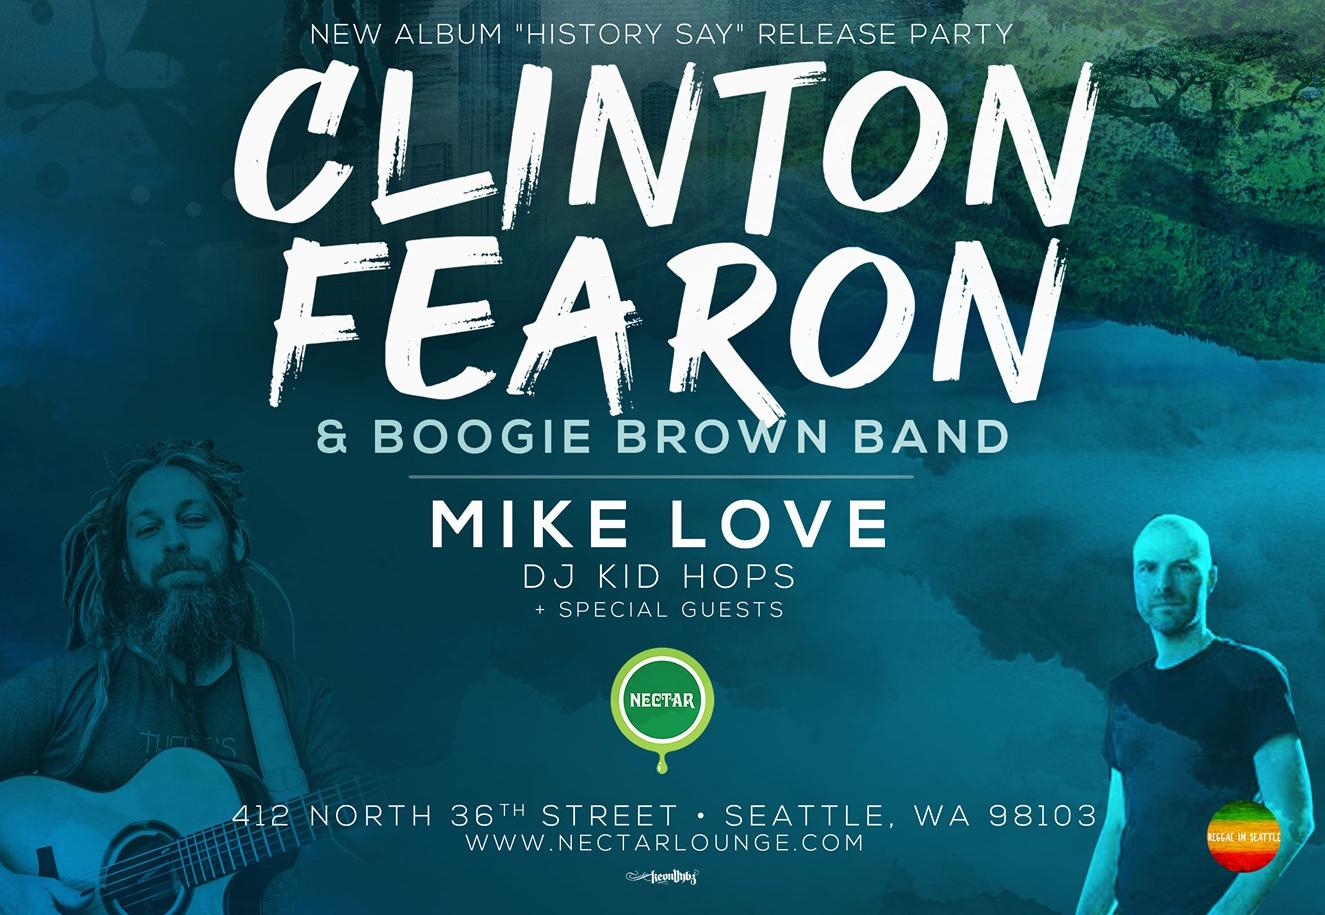 Clinton Fearon History Say